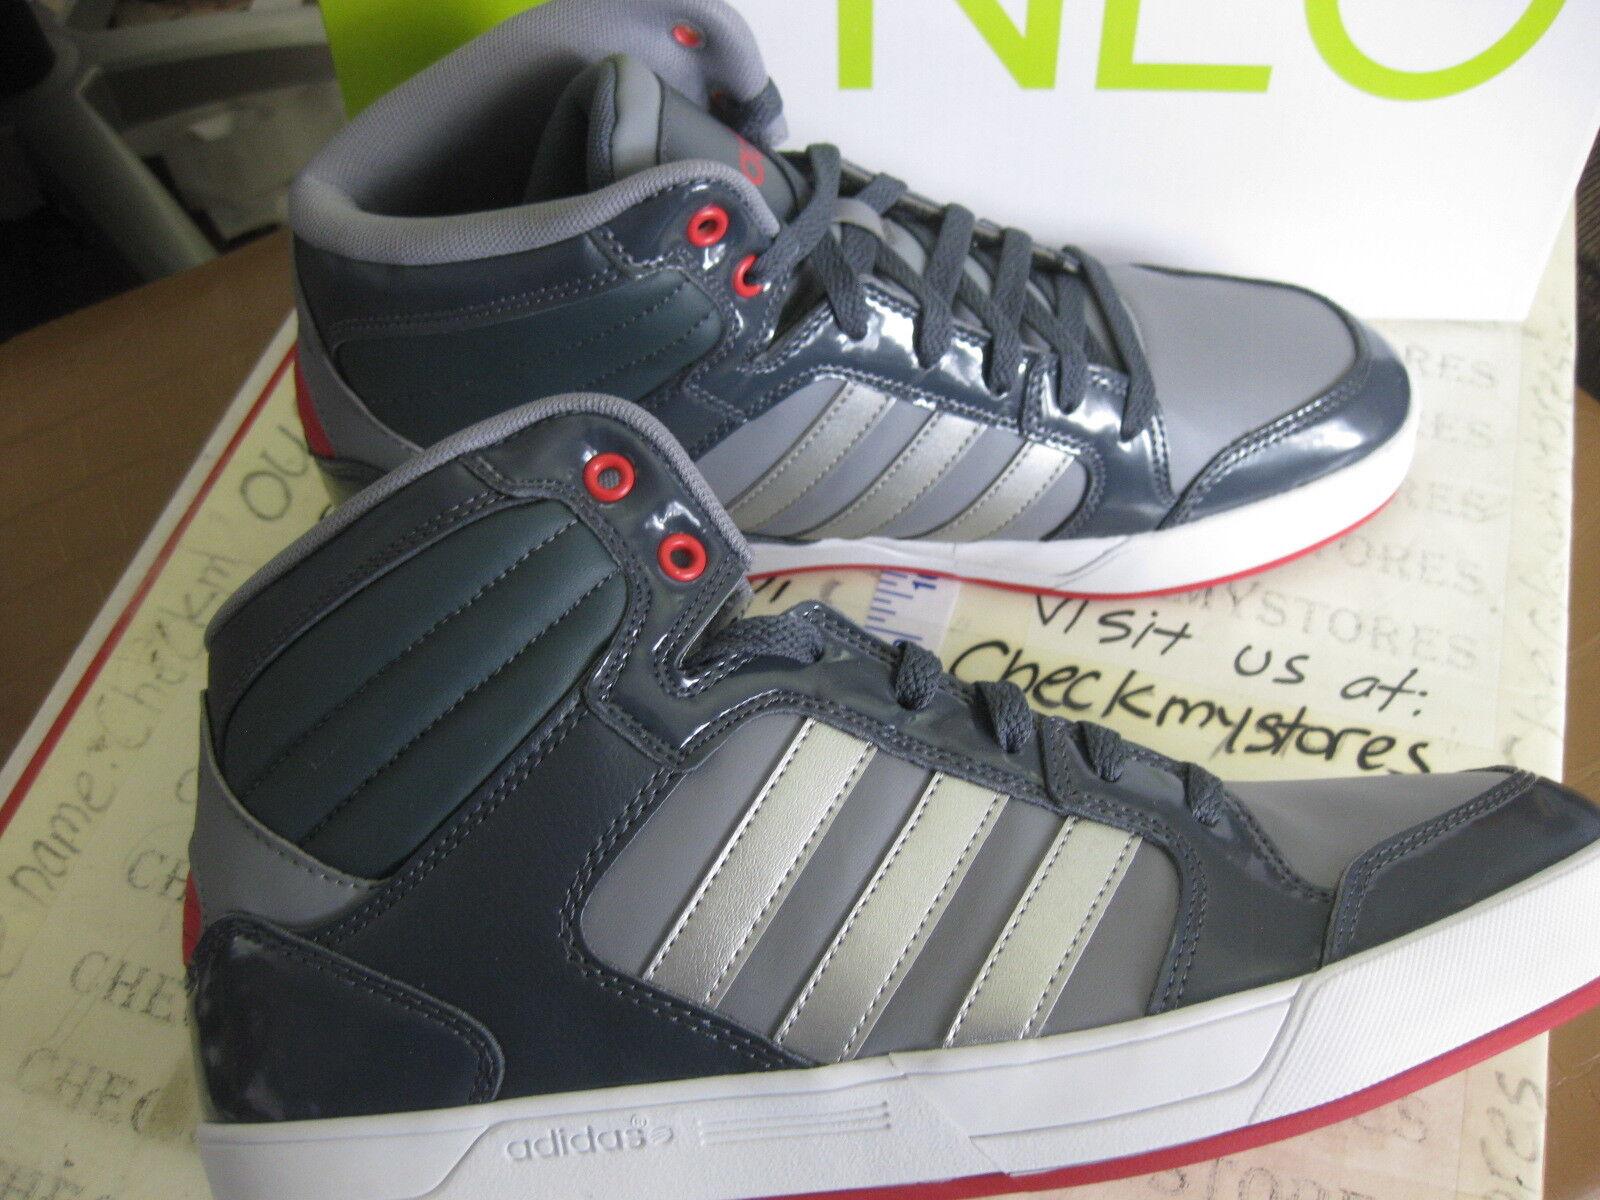 the latest a8538 2e50b Pennino adidas raleigh raleigh raleigh met f99122 uomini  atletico scarpe  da basket 89f7eb